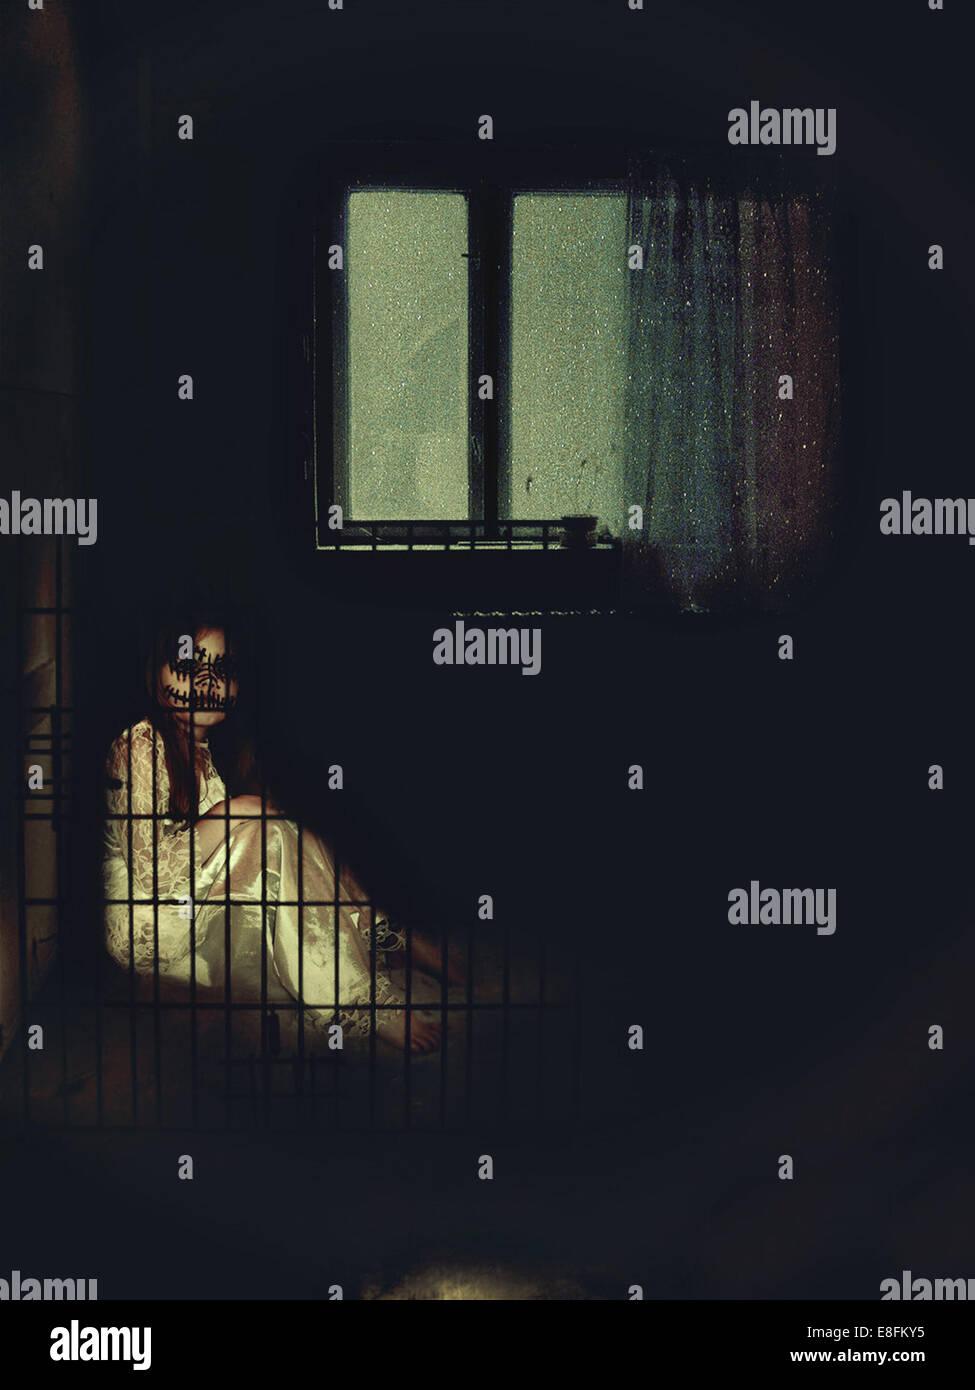 Beängstigend Kind im Käfig Stockbild